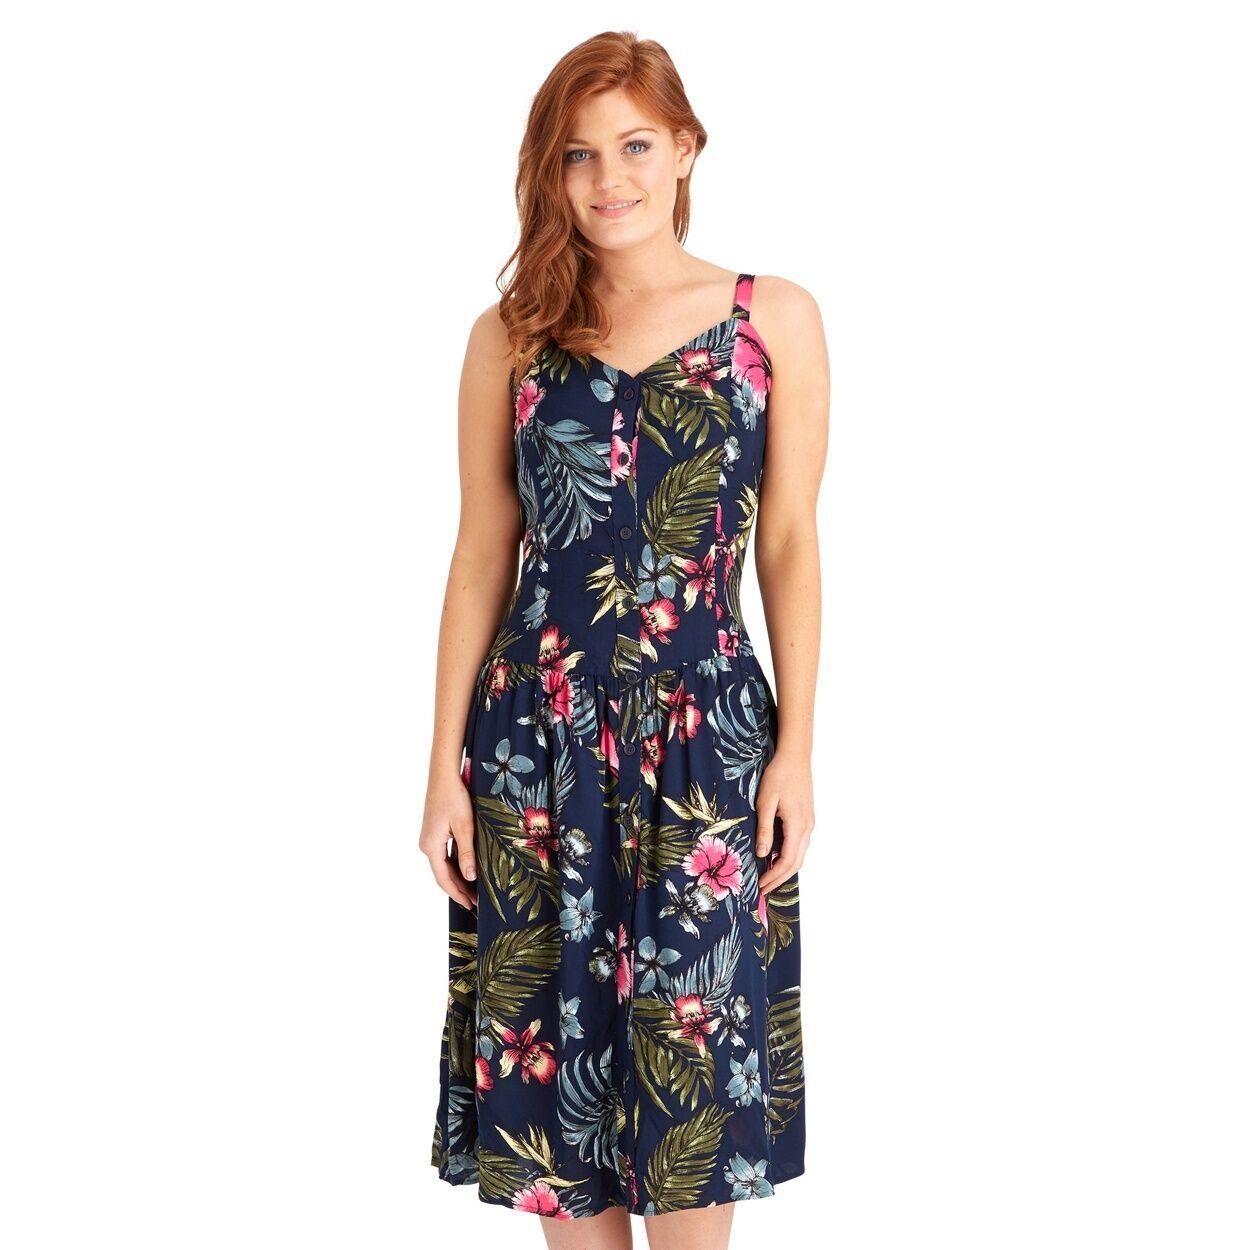 Joe Browns Multi colord Favorite Dress Size 10 RE076 GG 09